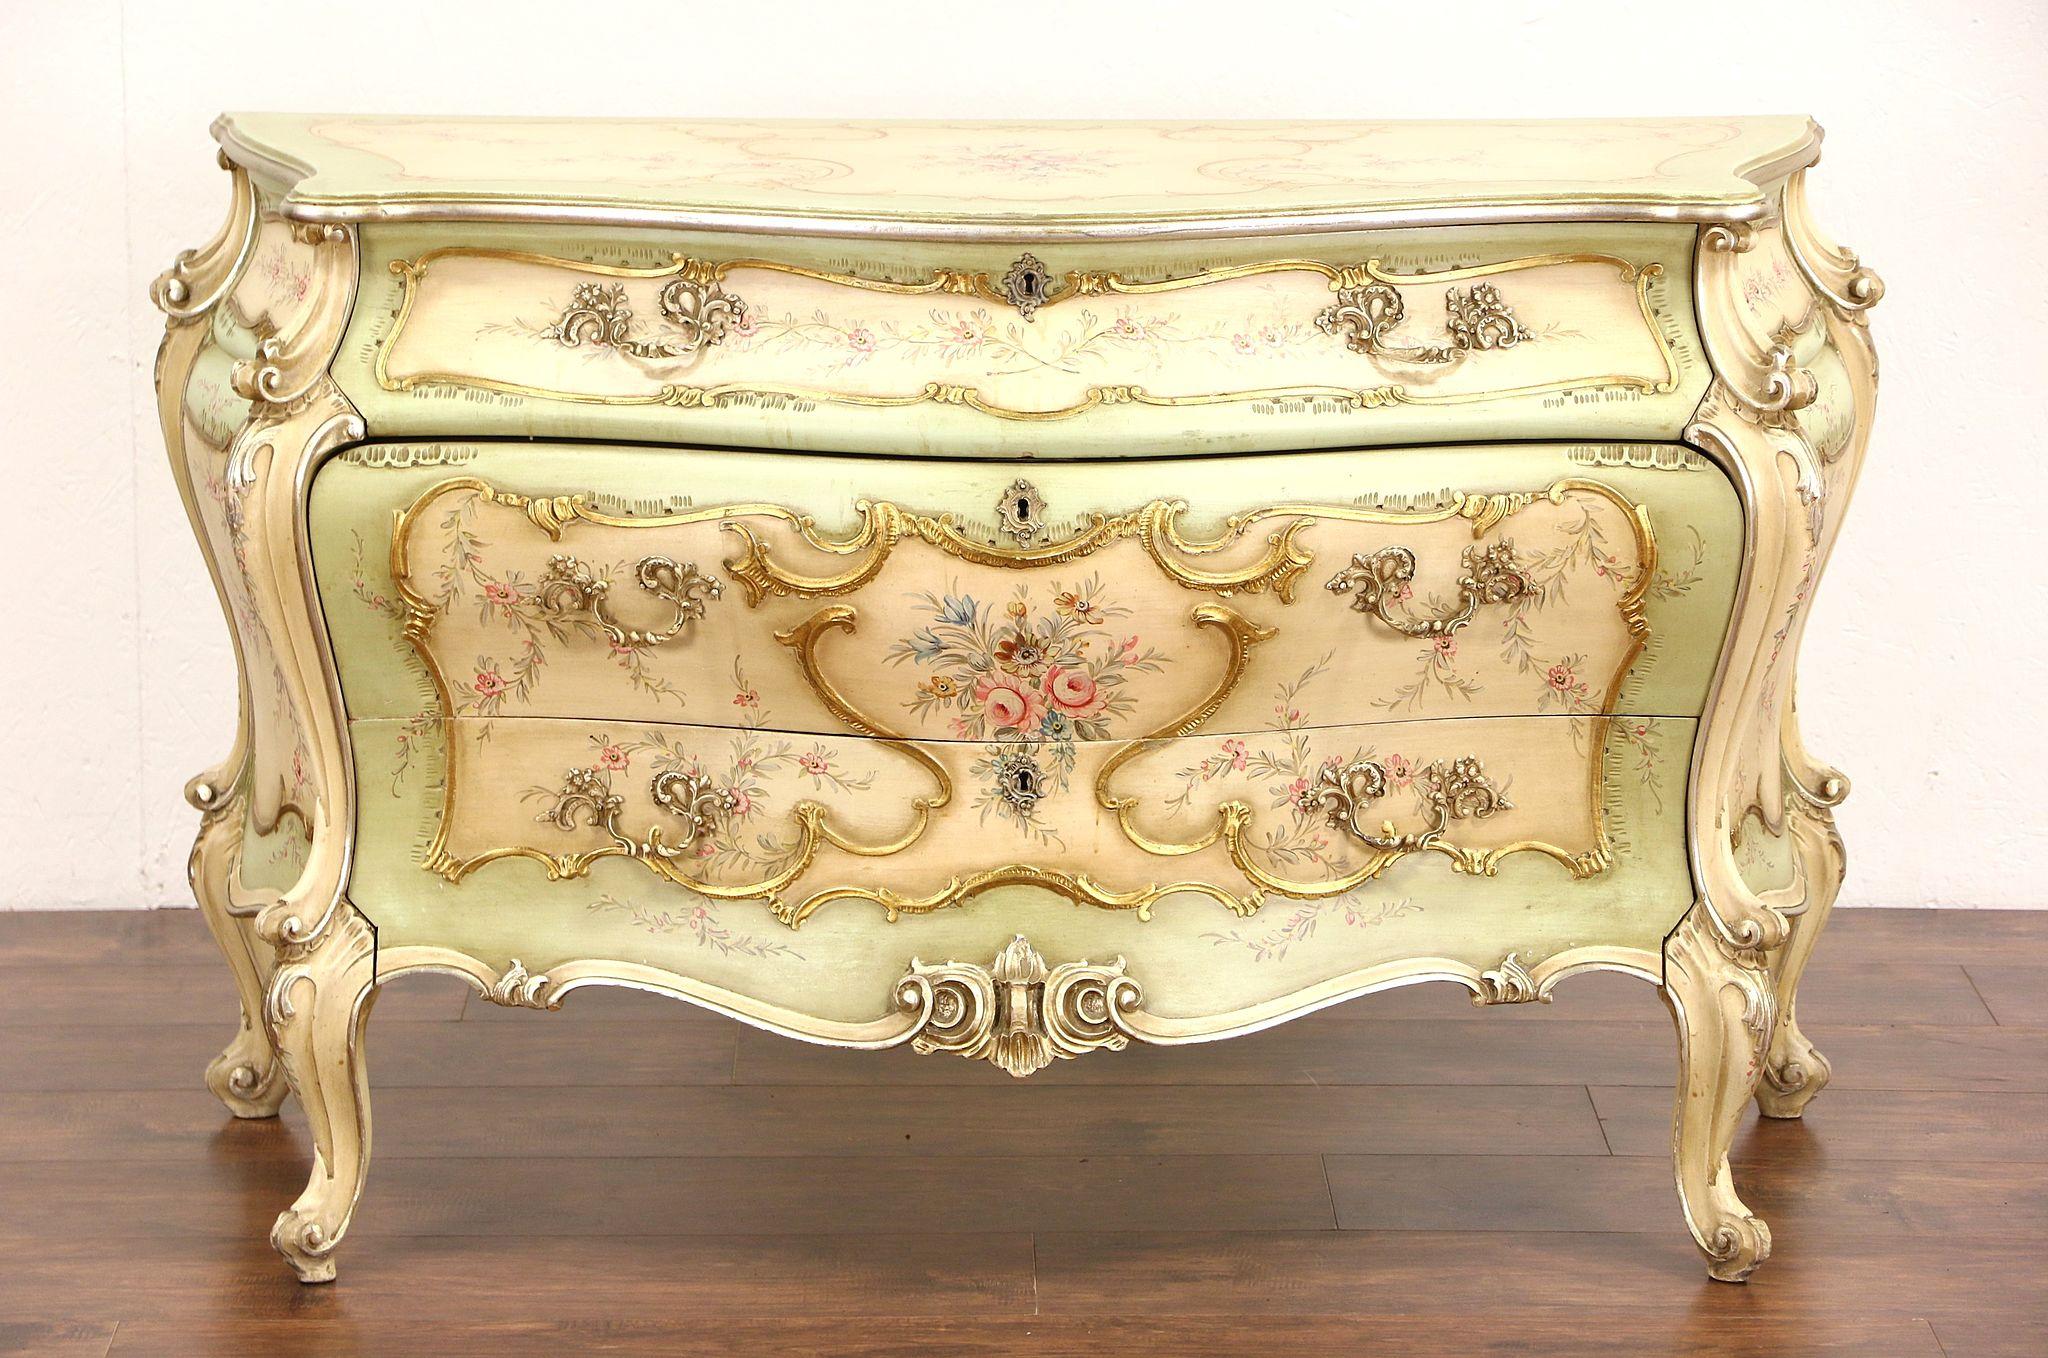 Sold Venetian Hand Painted Baroque Design Vintage